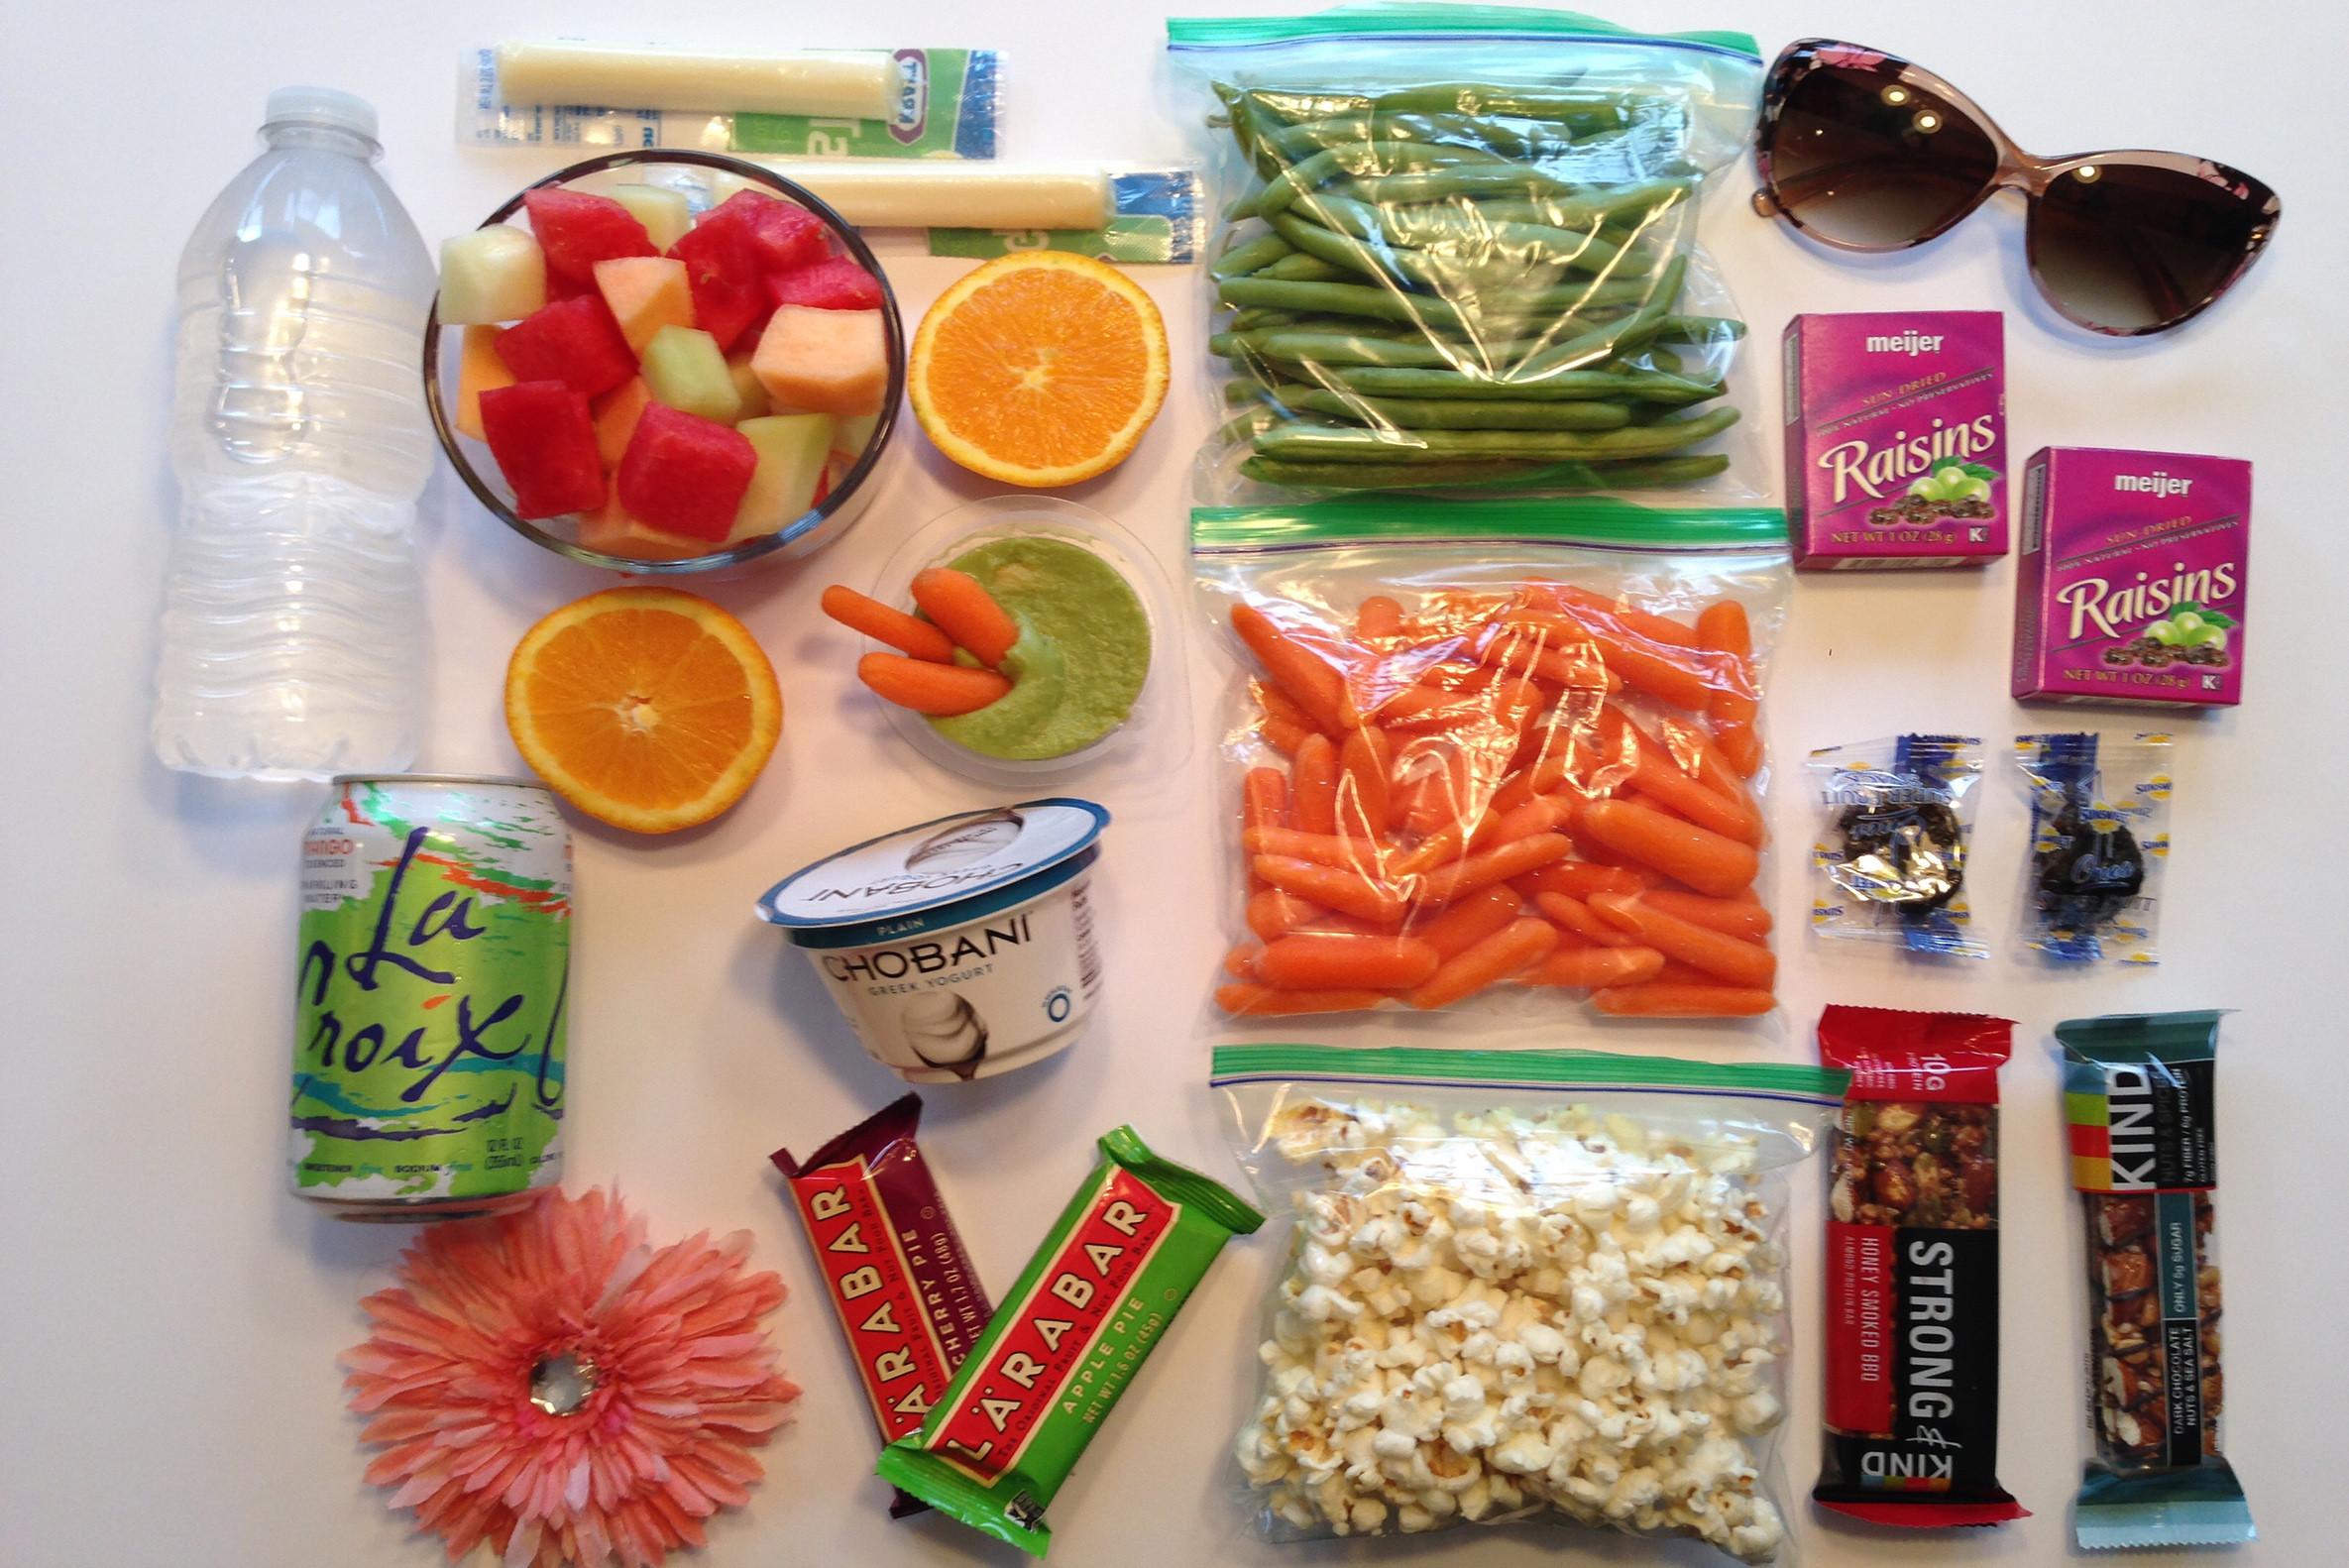 Road Trip Snacks Healthy  Healthy Road Trip Snacks – Fit & Fresh